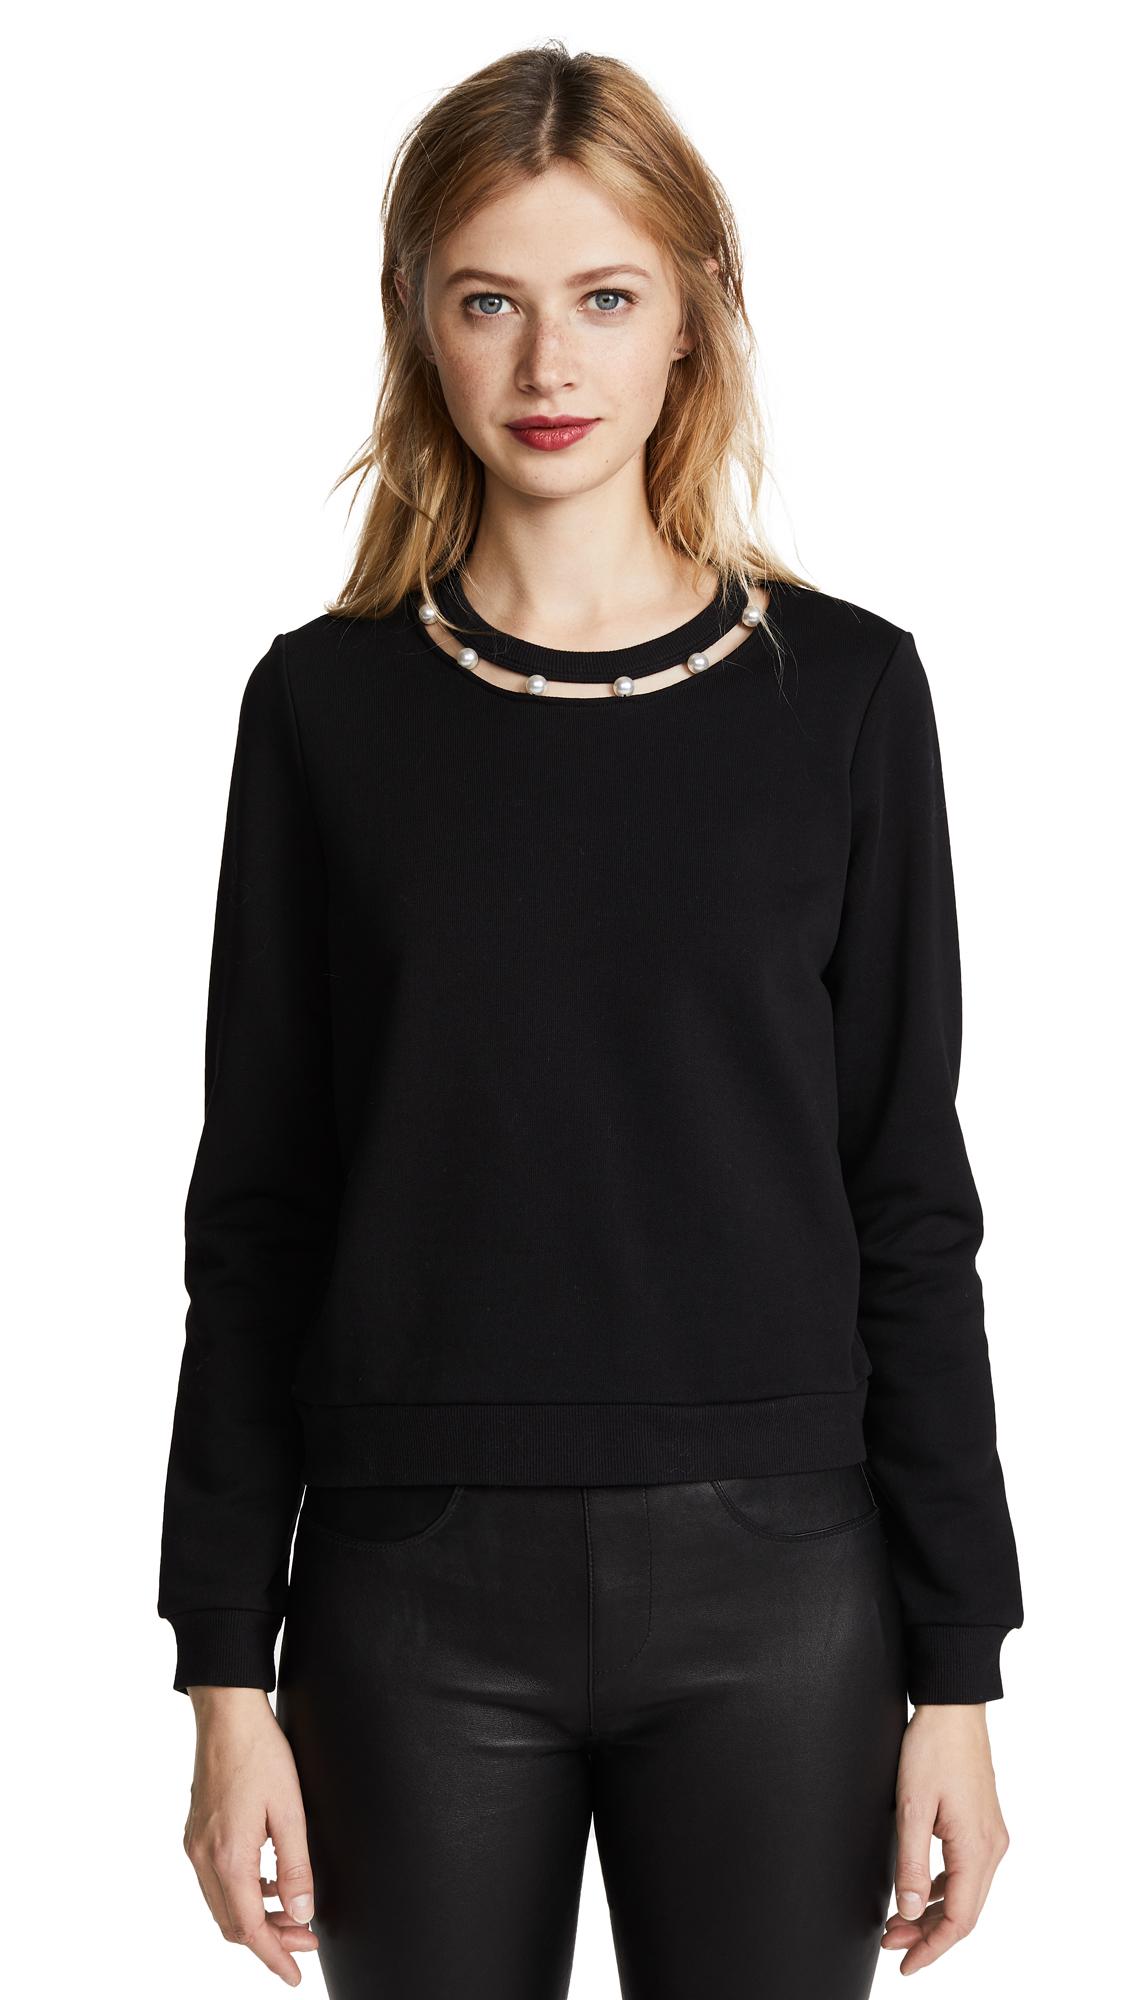 Rebecca Minkoff Open Neckline Sweatshirt - Black